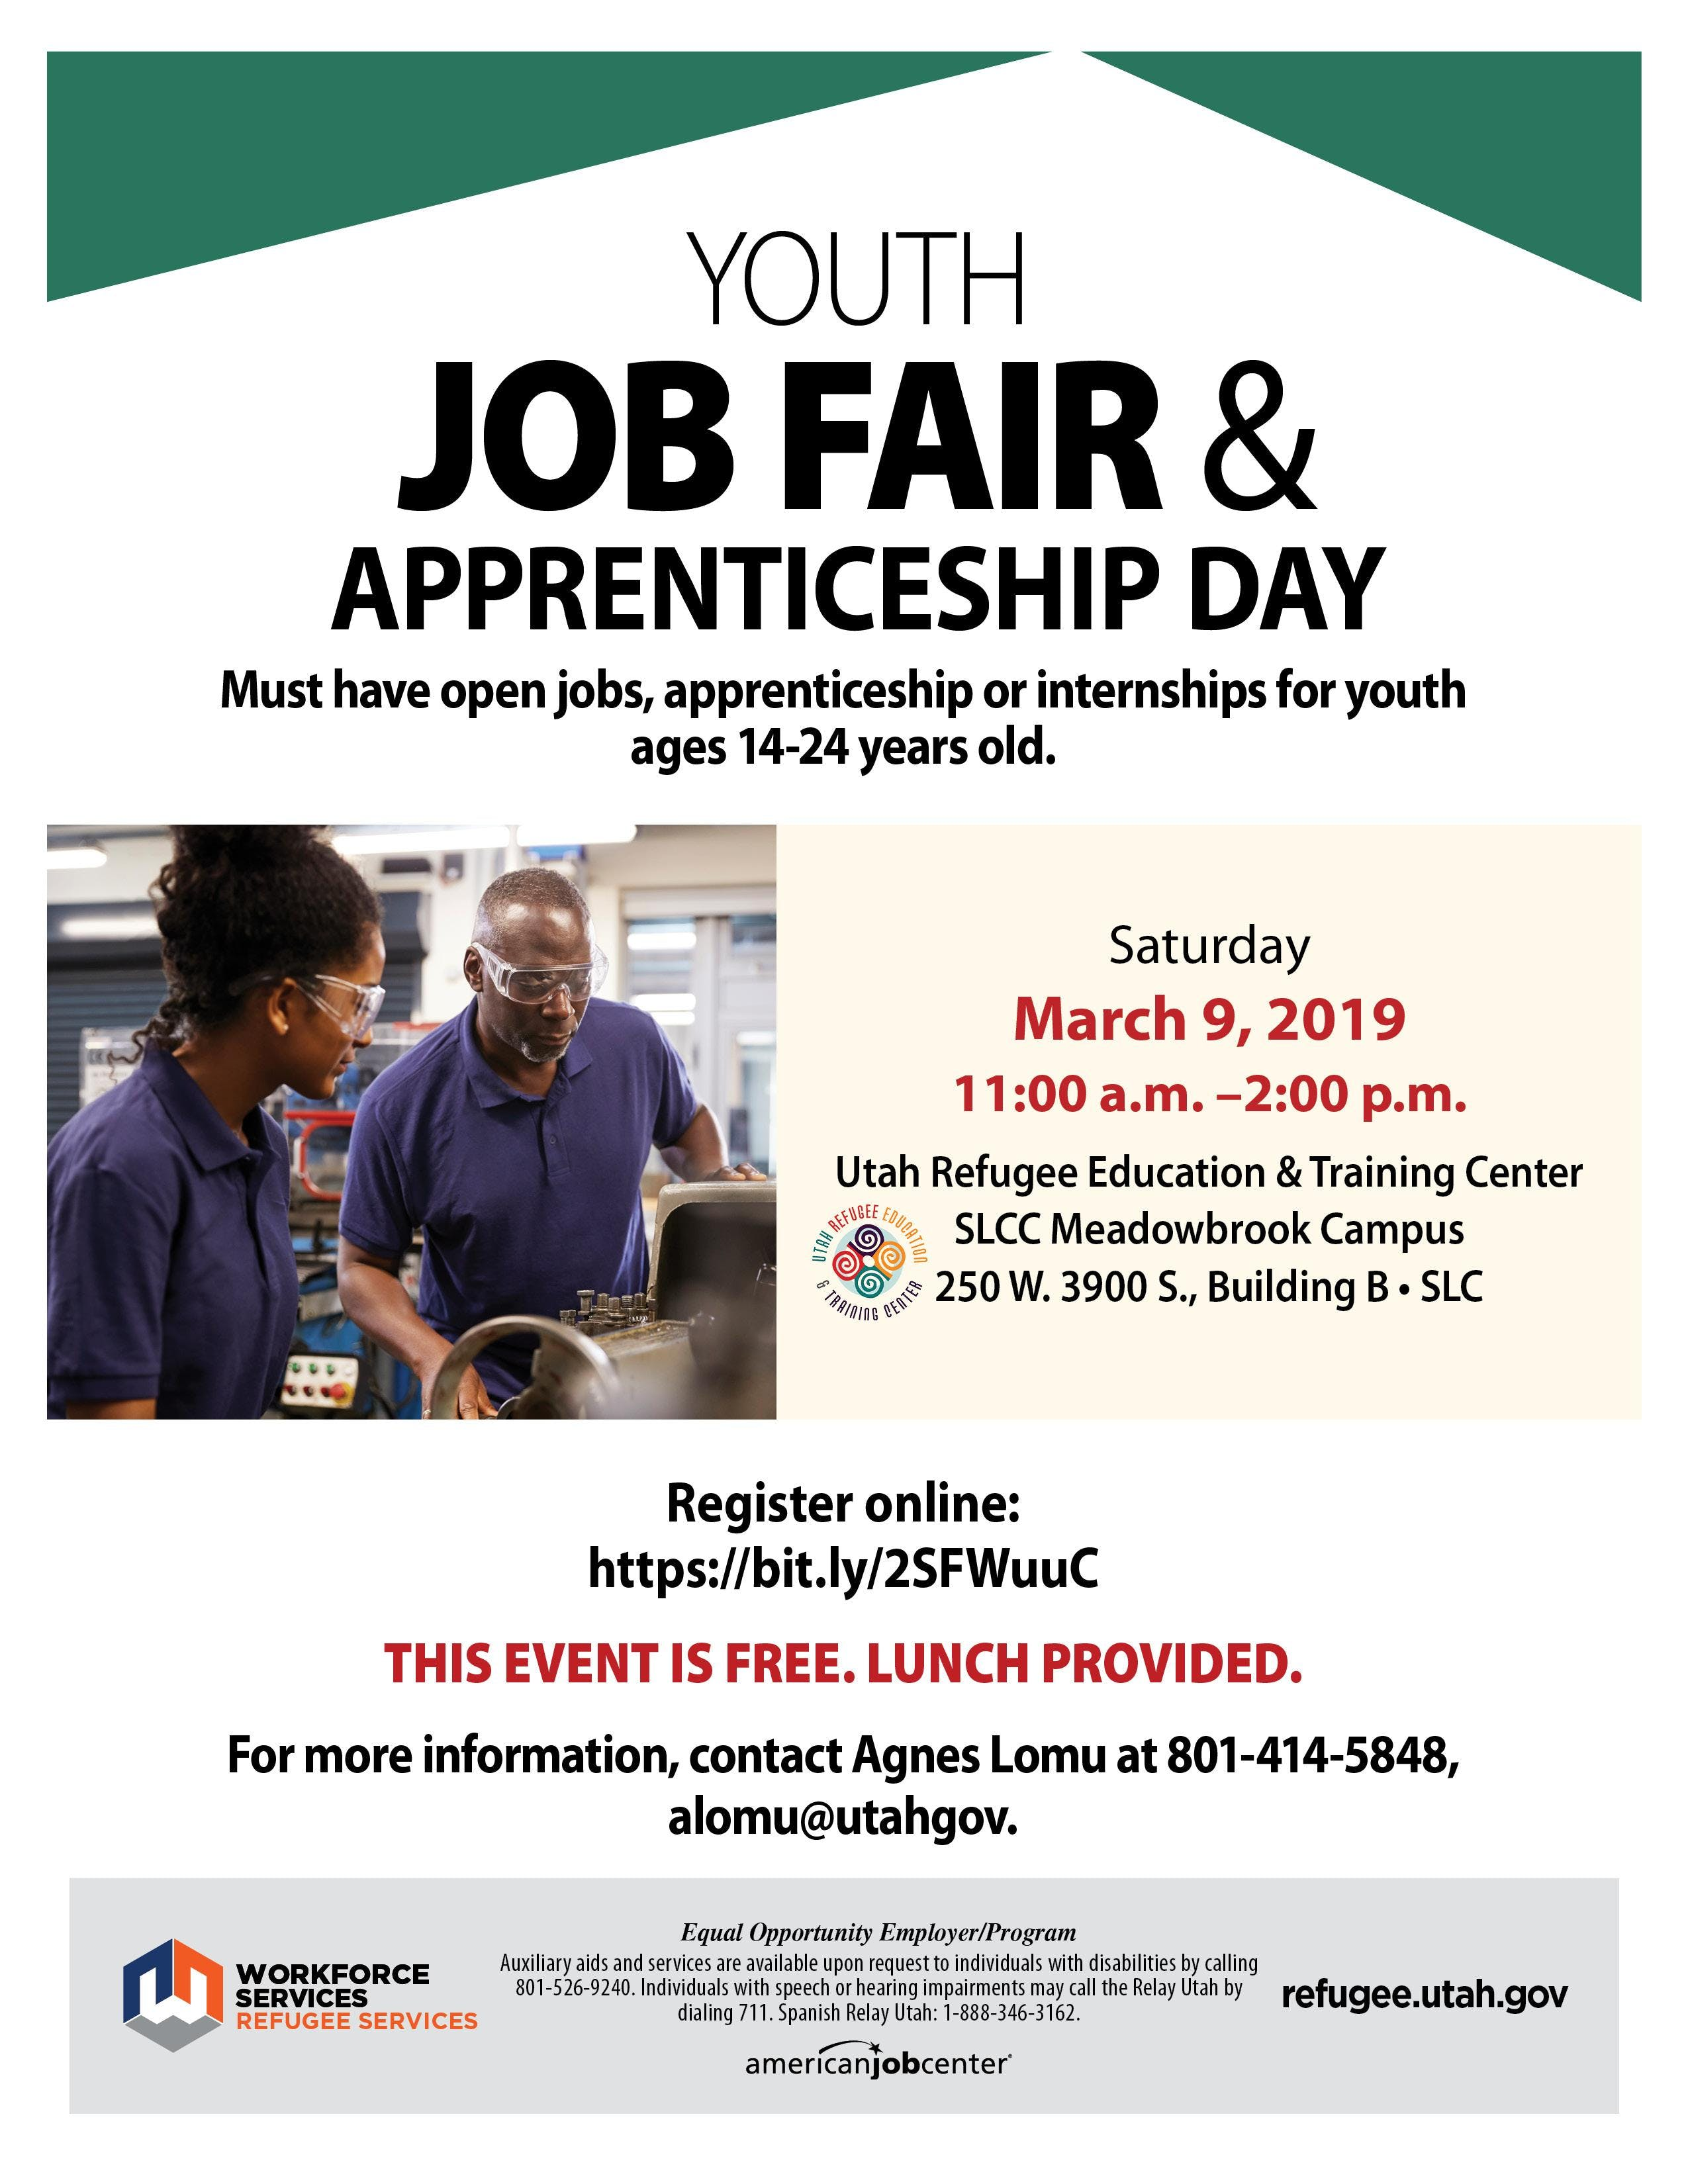 Youth Job Fair Apprenticeship Day 9 Mar 2019